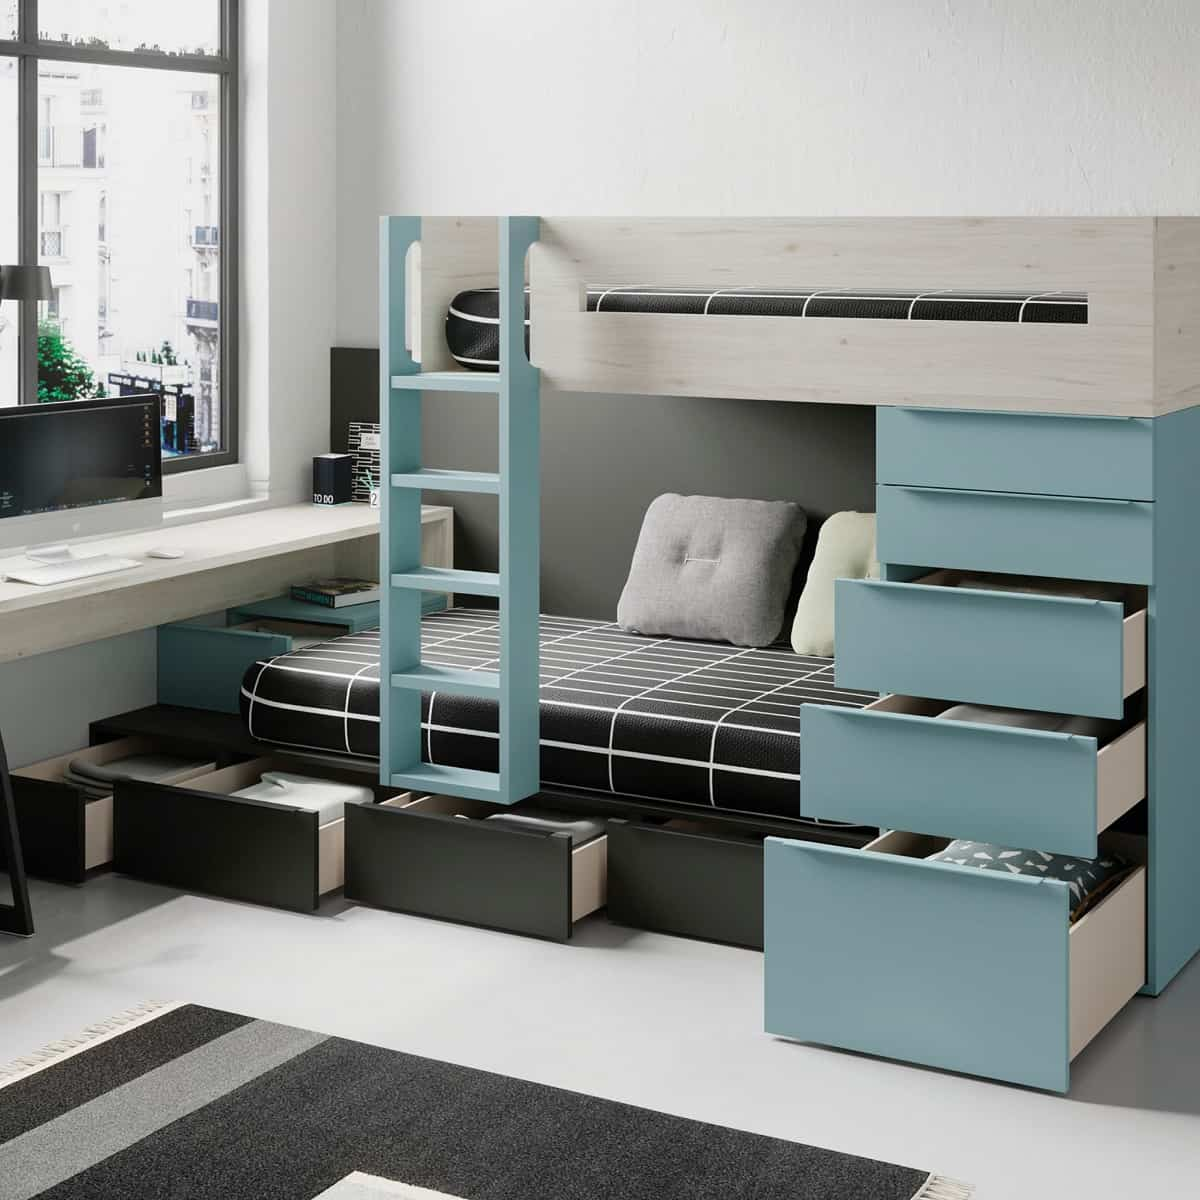 Ideas para crear espacios de estudios en casa 9